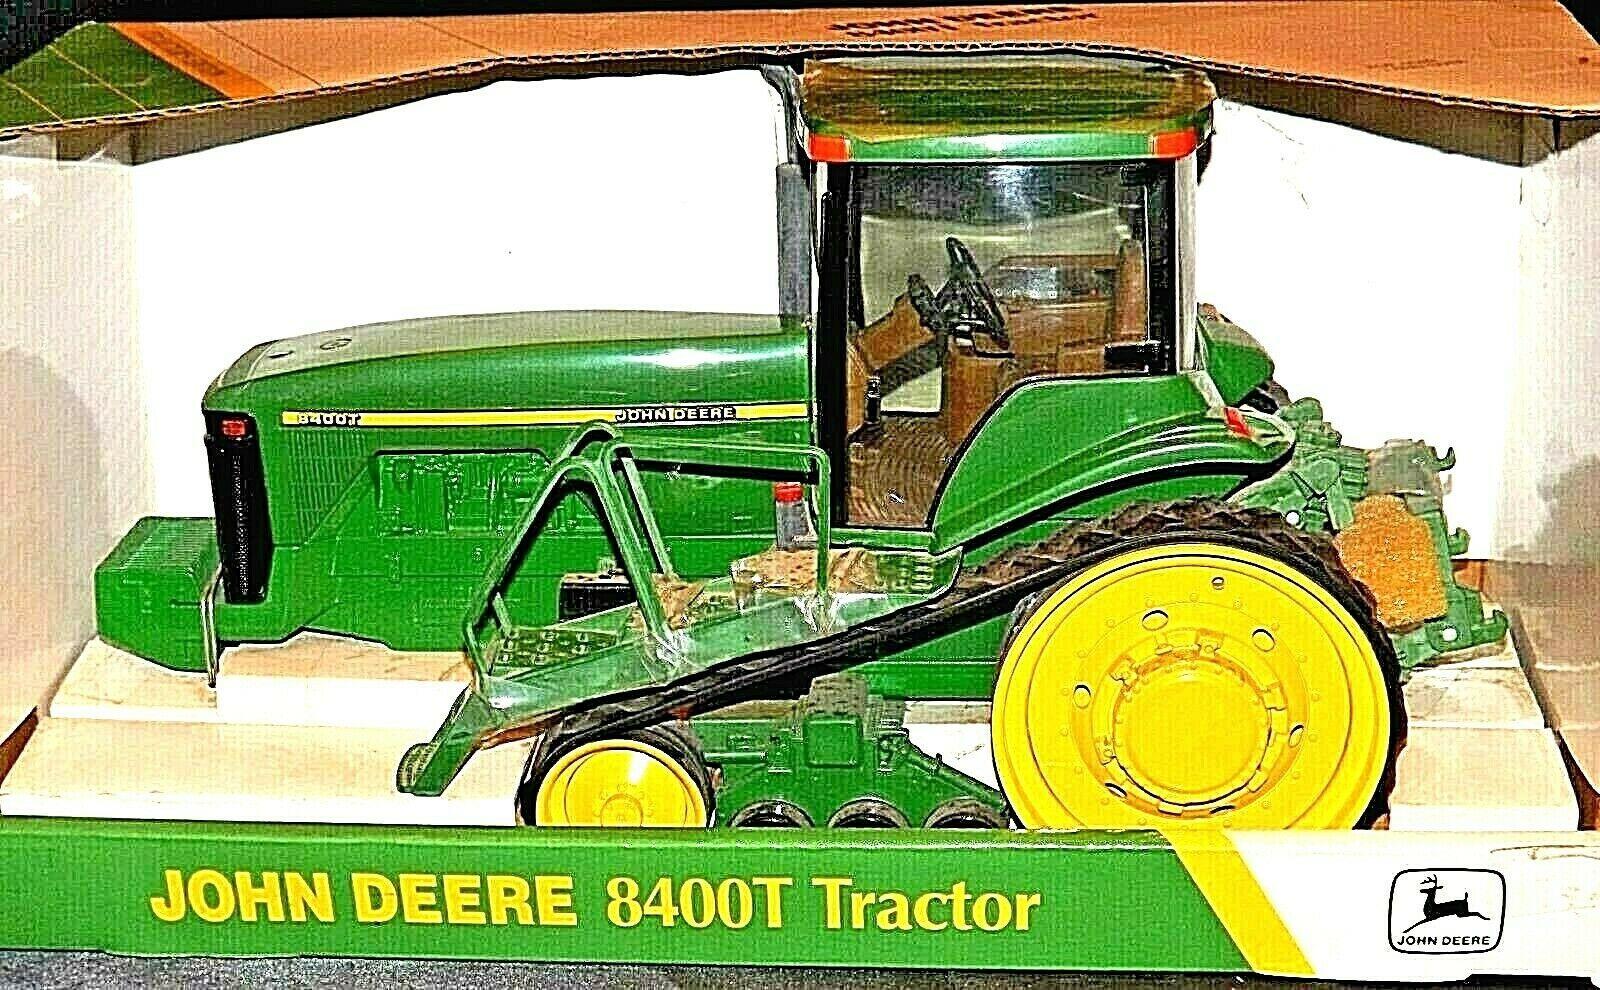 John Deere 8400T Tractor MFWD Replica w/ Box 1/16 Scale Collectors Edition AA20-